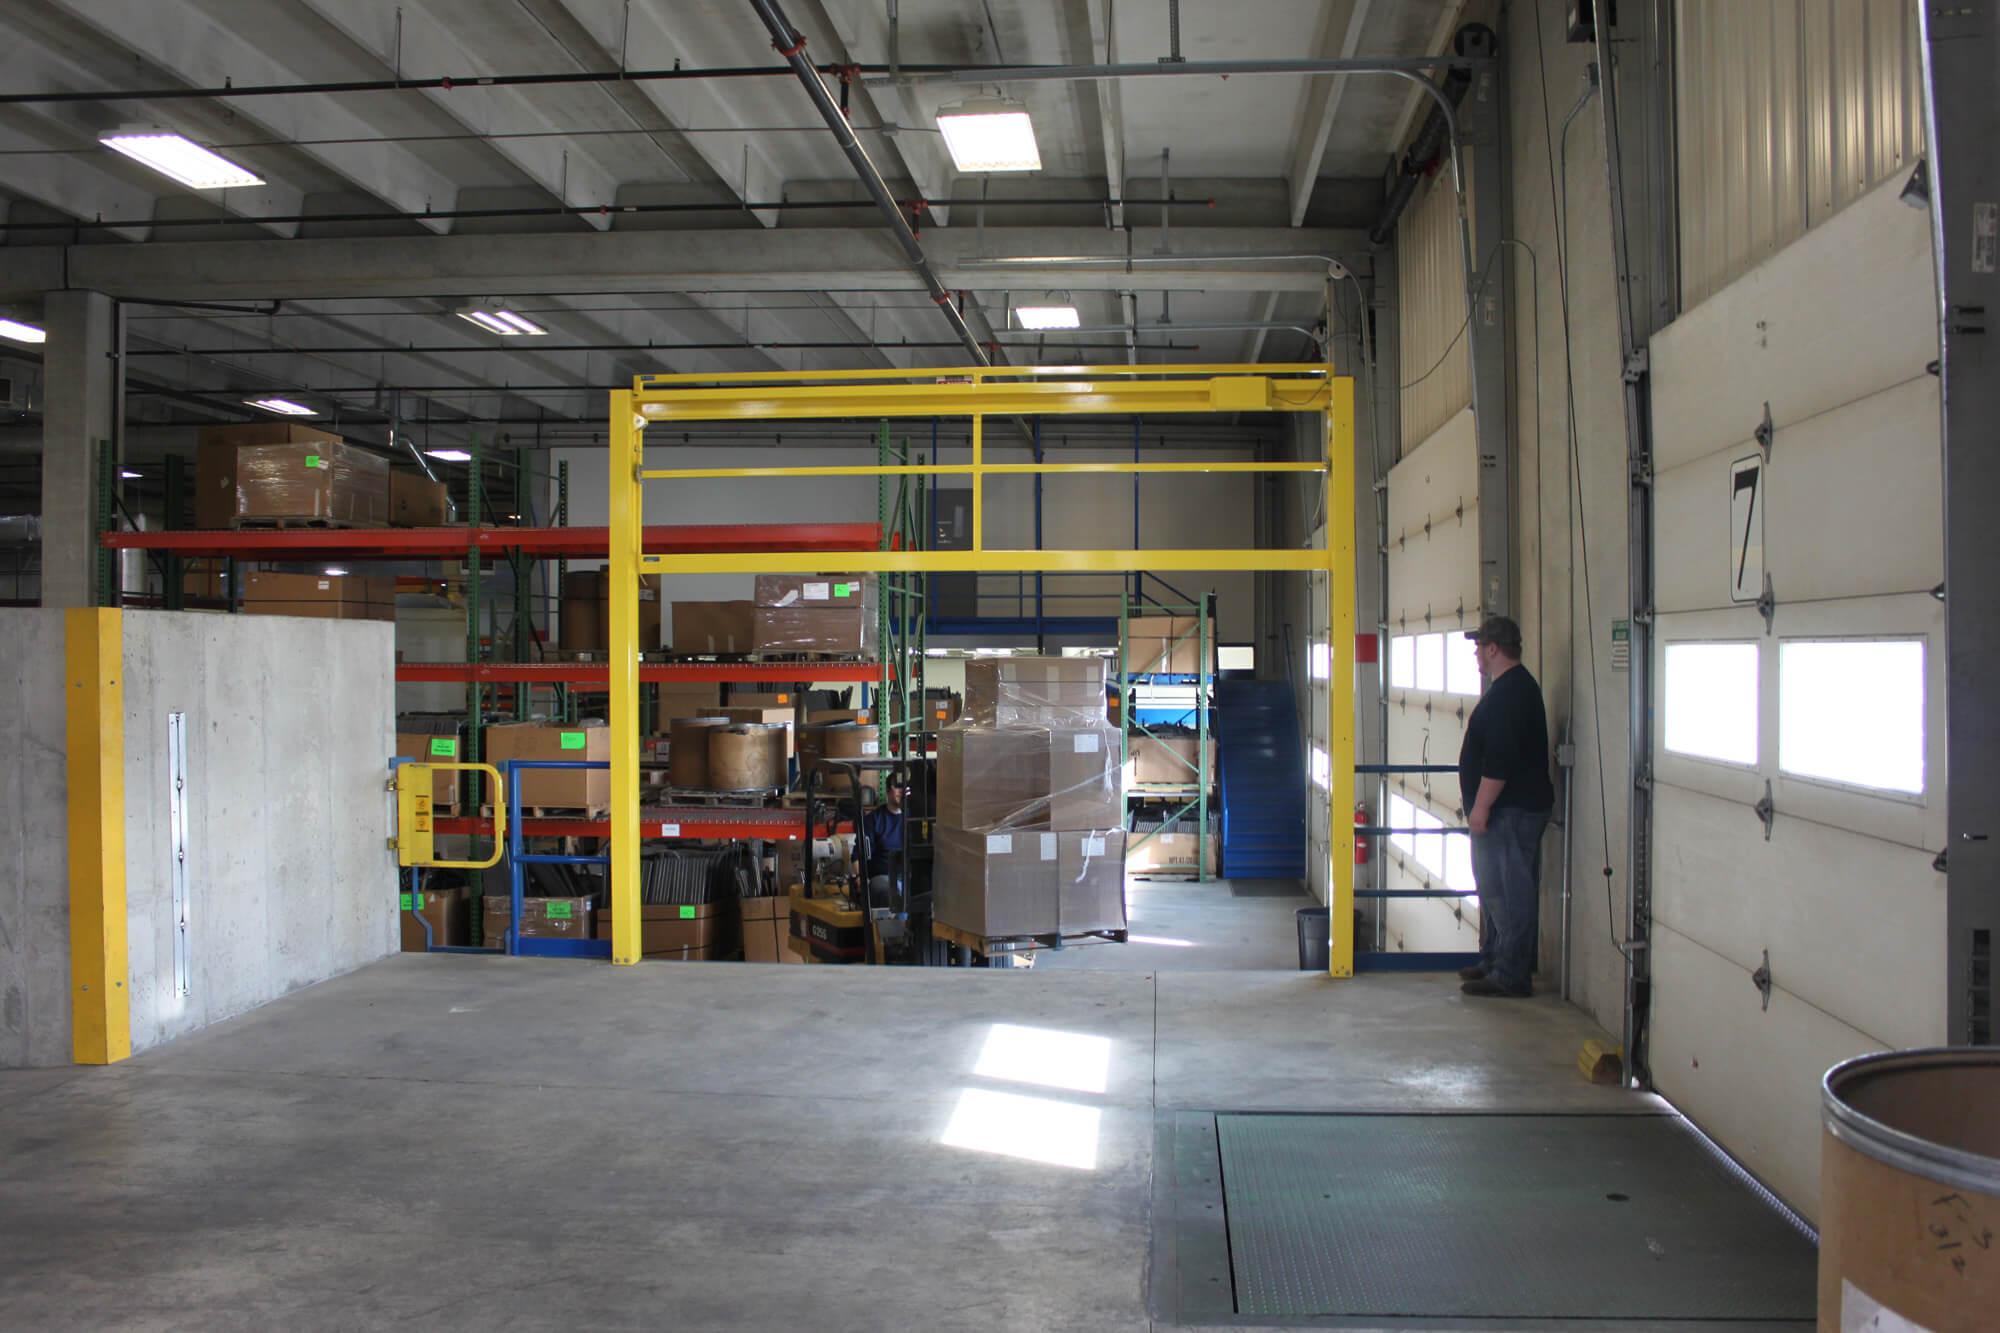 Safemezz 174 Vertical Gate Ps Safety Access